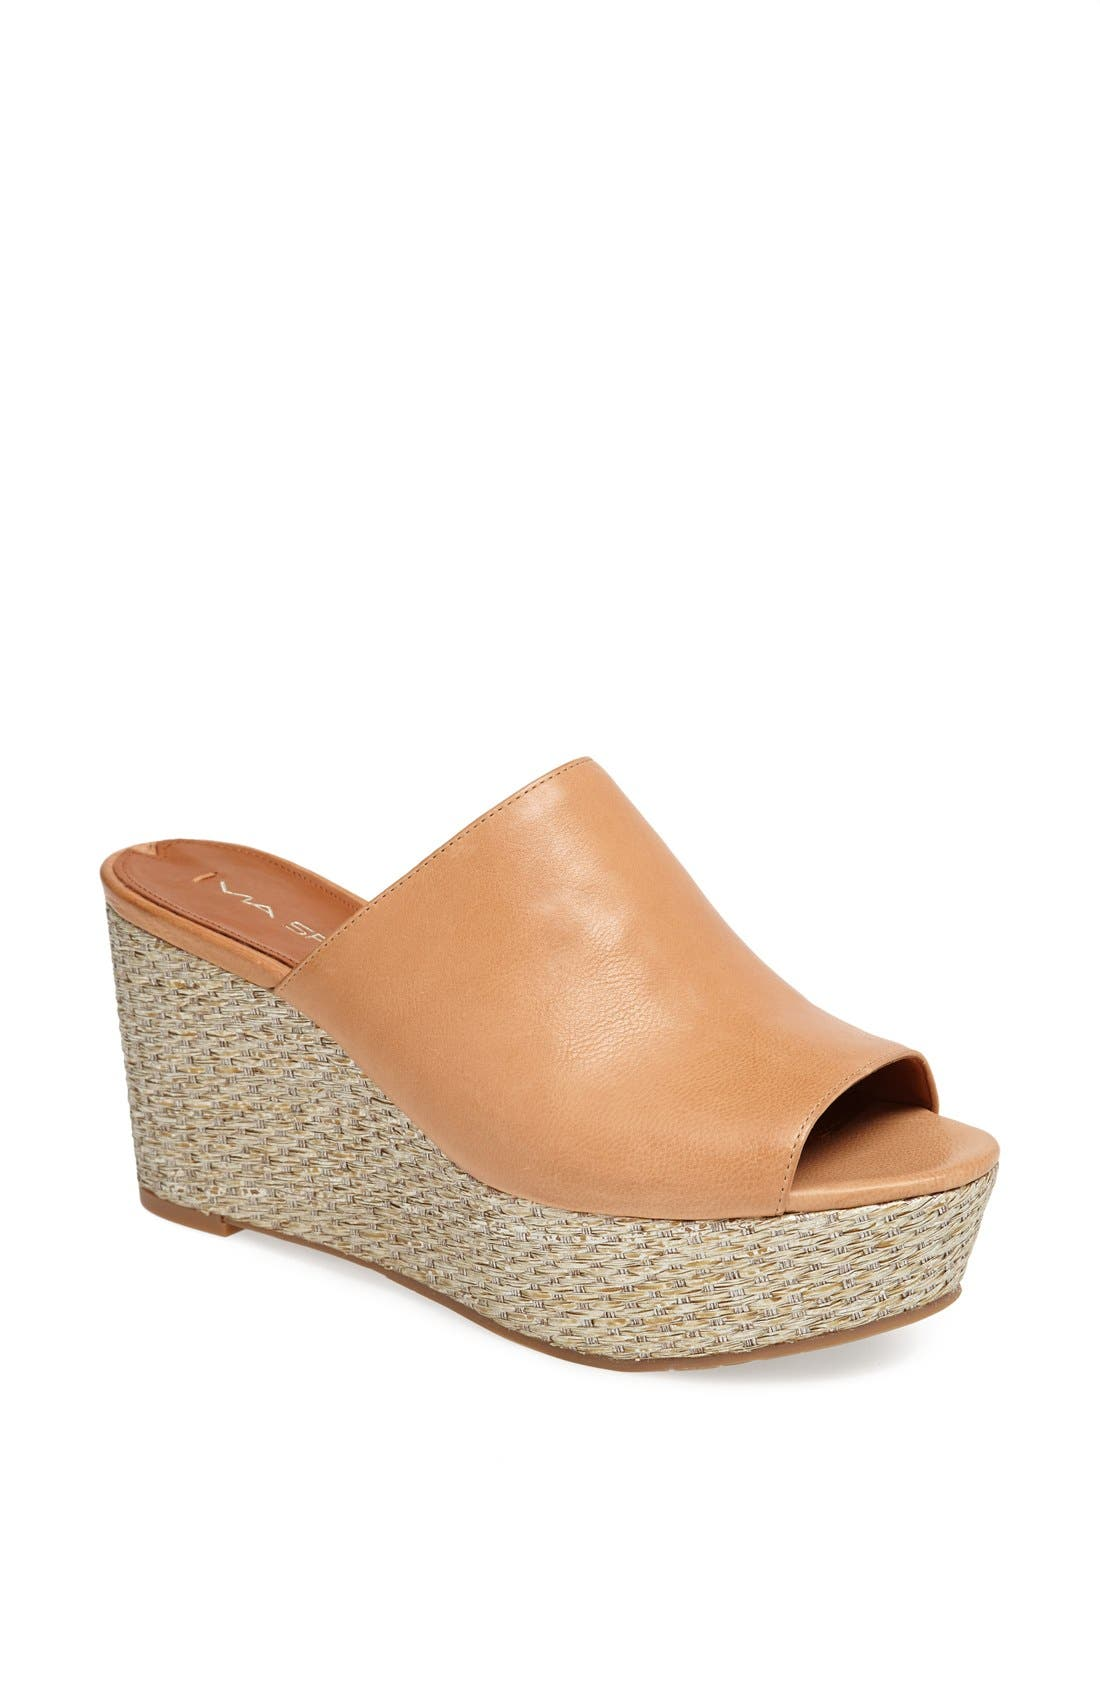 Main Image - Via Spiga 'Hale' Wedge Sandal